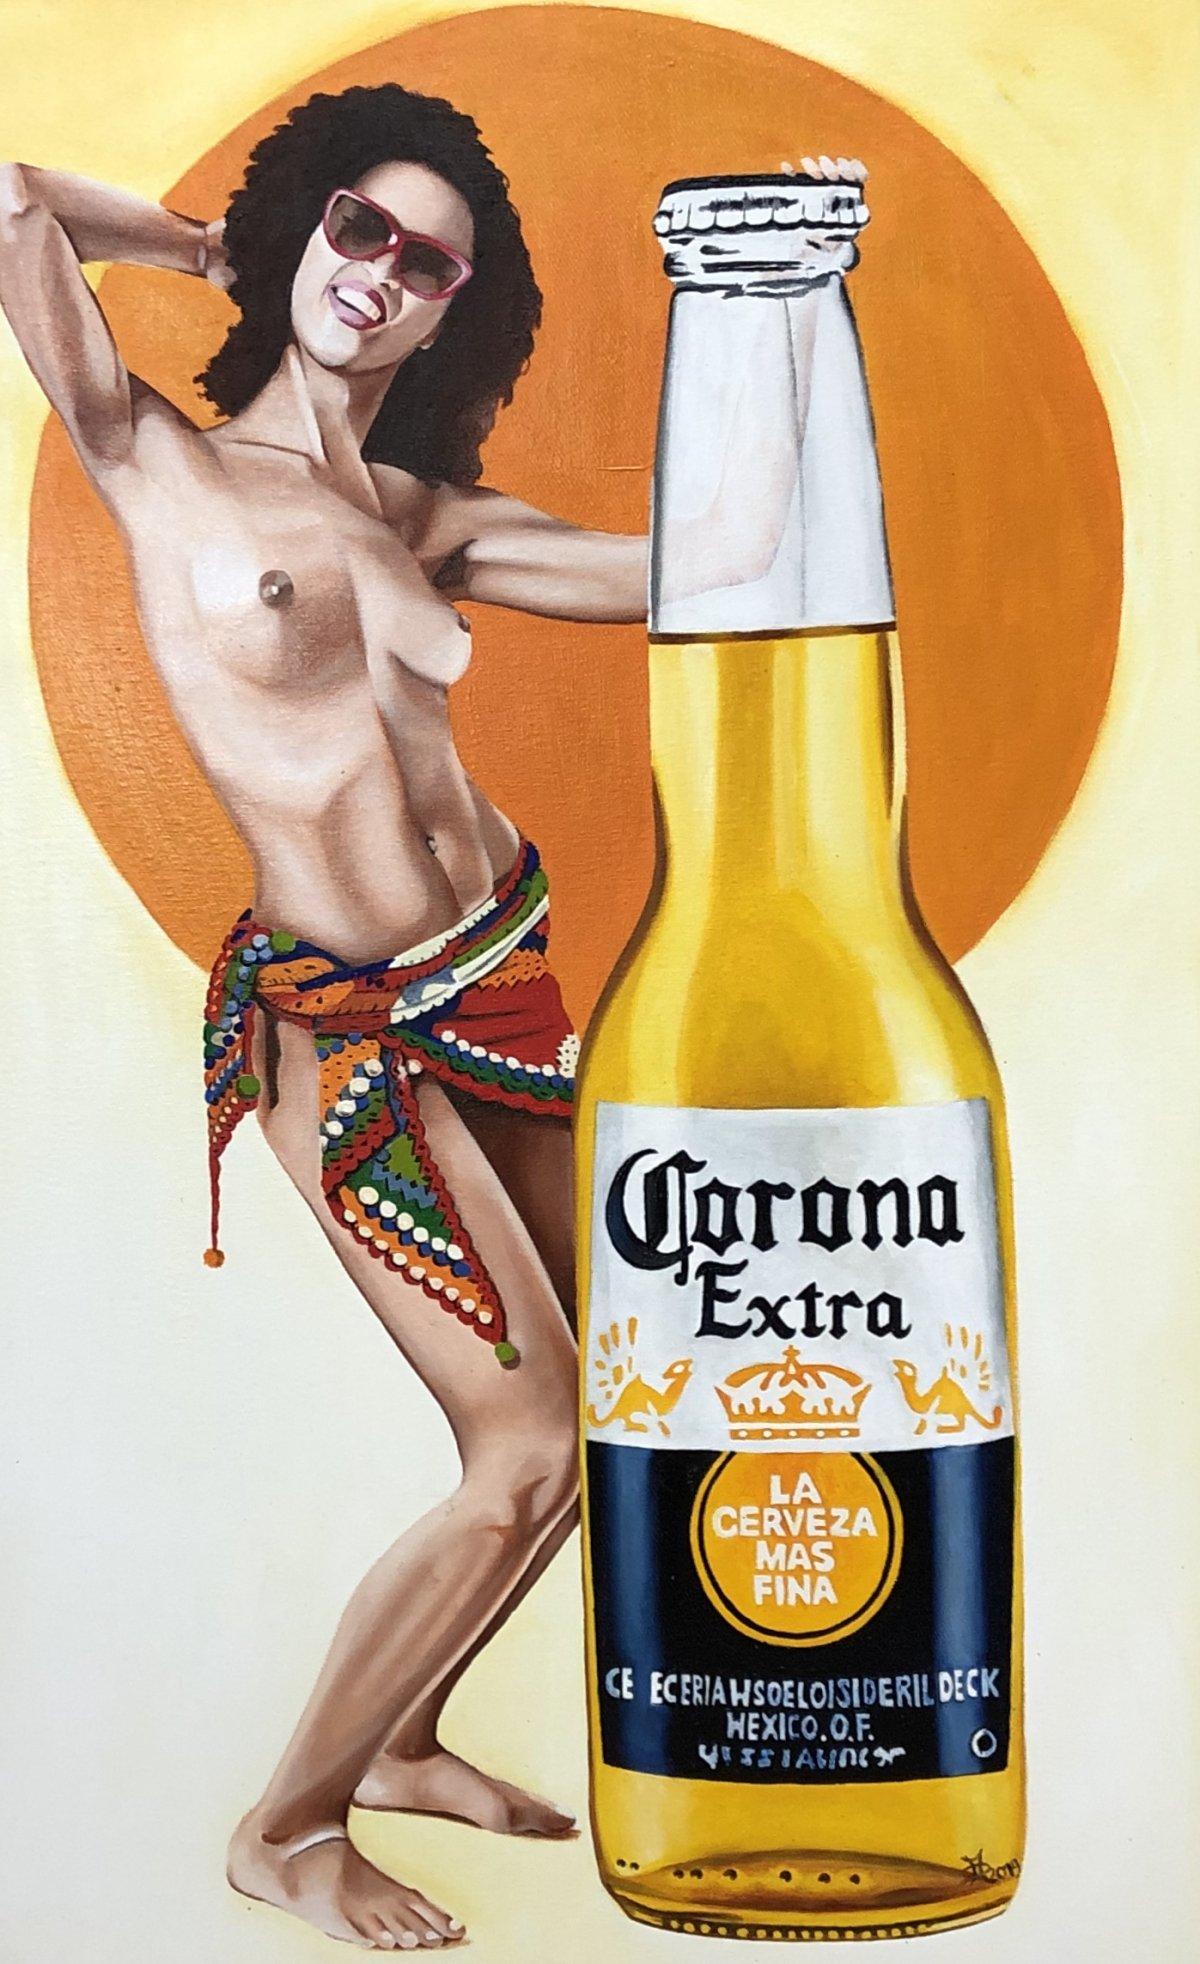 Corona-extra-maaikedirkx-pinup-popart-streetart-urbanart-galeroie-hamburg-popstreetshop